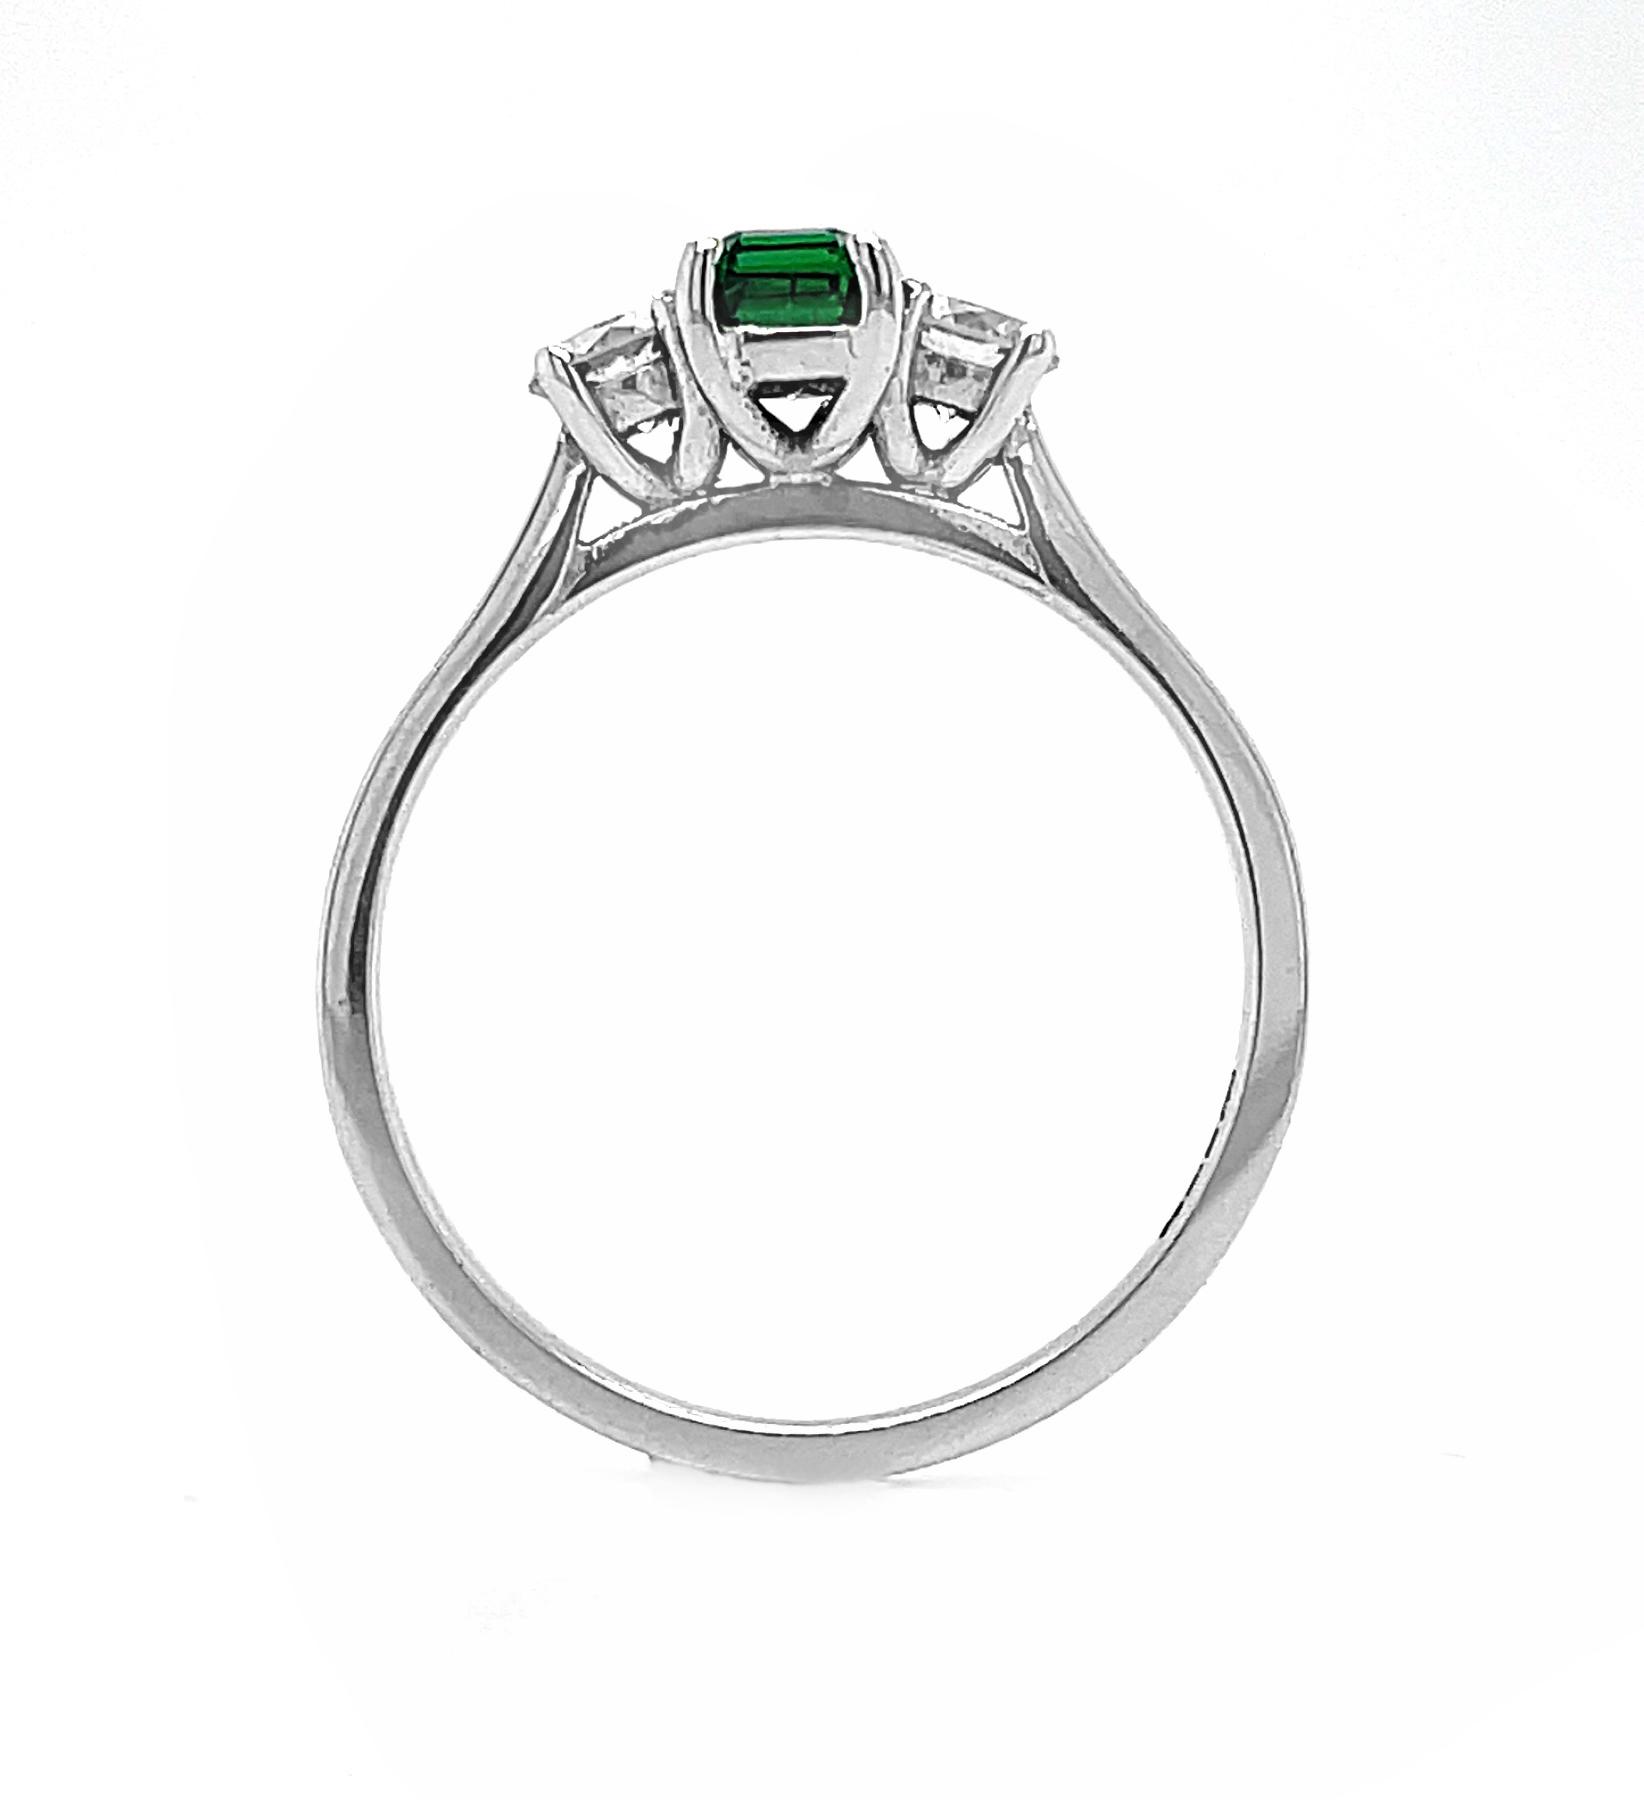 18k White Gold 3 Stone Octagonal Emerald & Brilliant Cut Diamond Ring